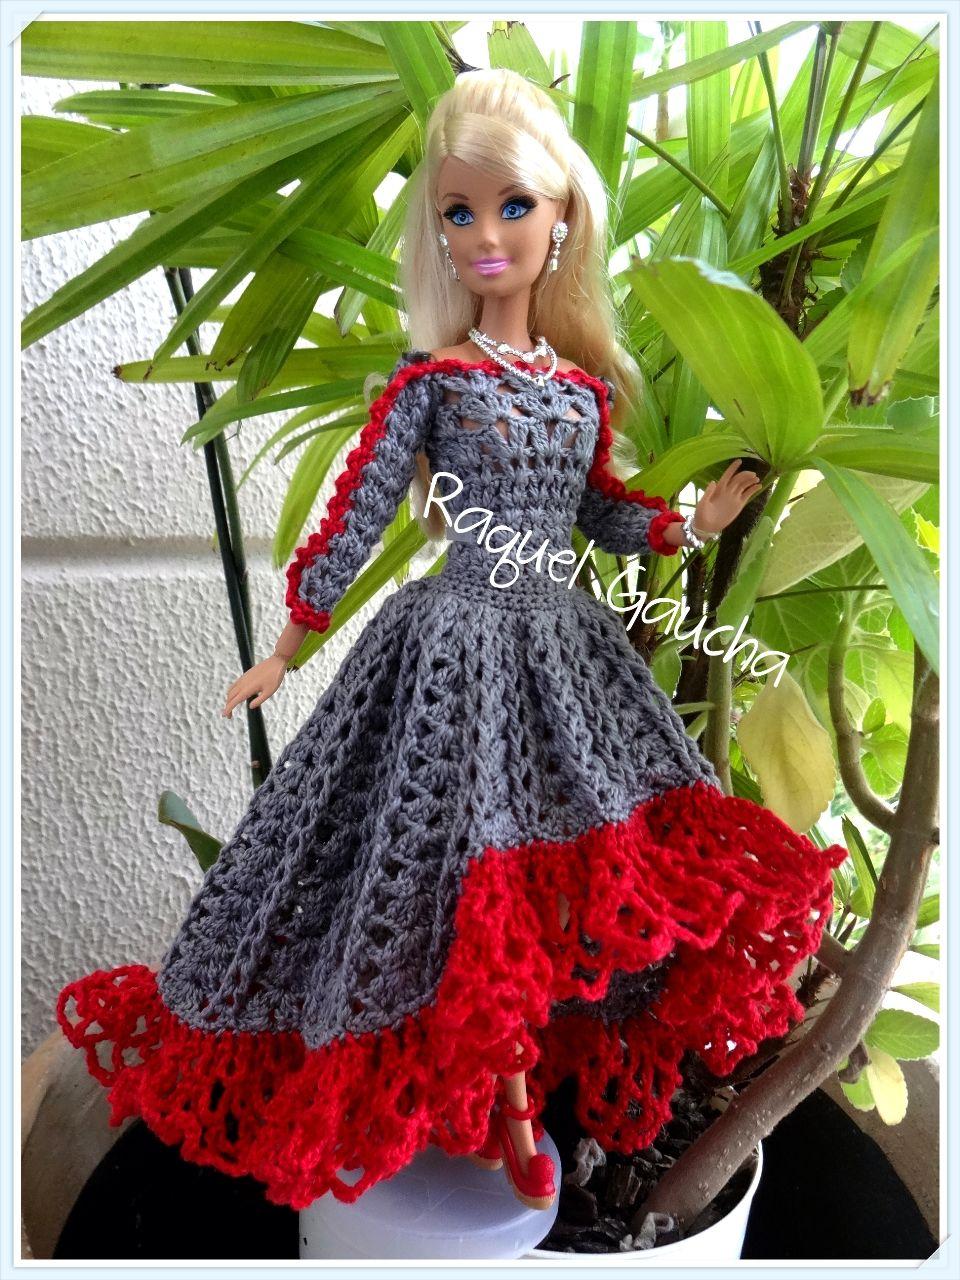 Pin von teresa tompkins auf barbie crochet dresses | Pinterest ...